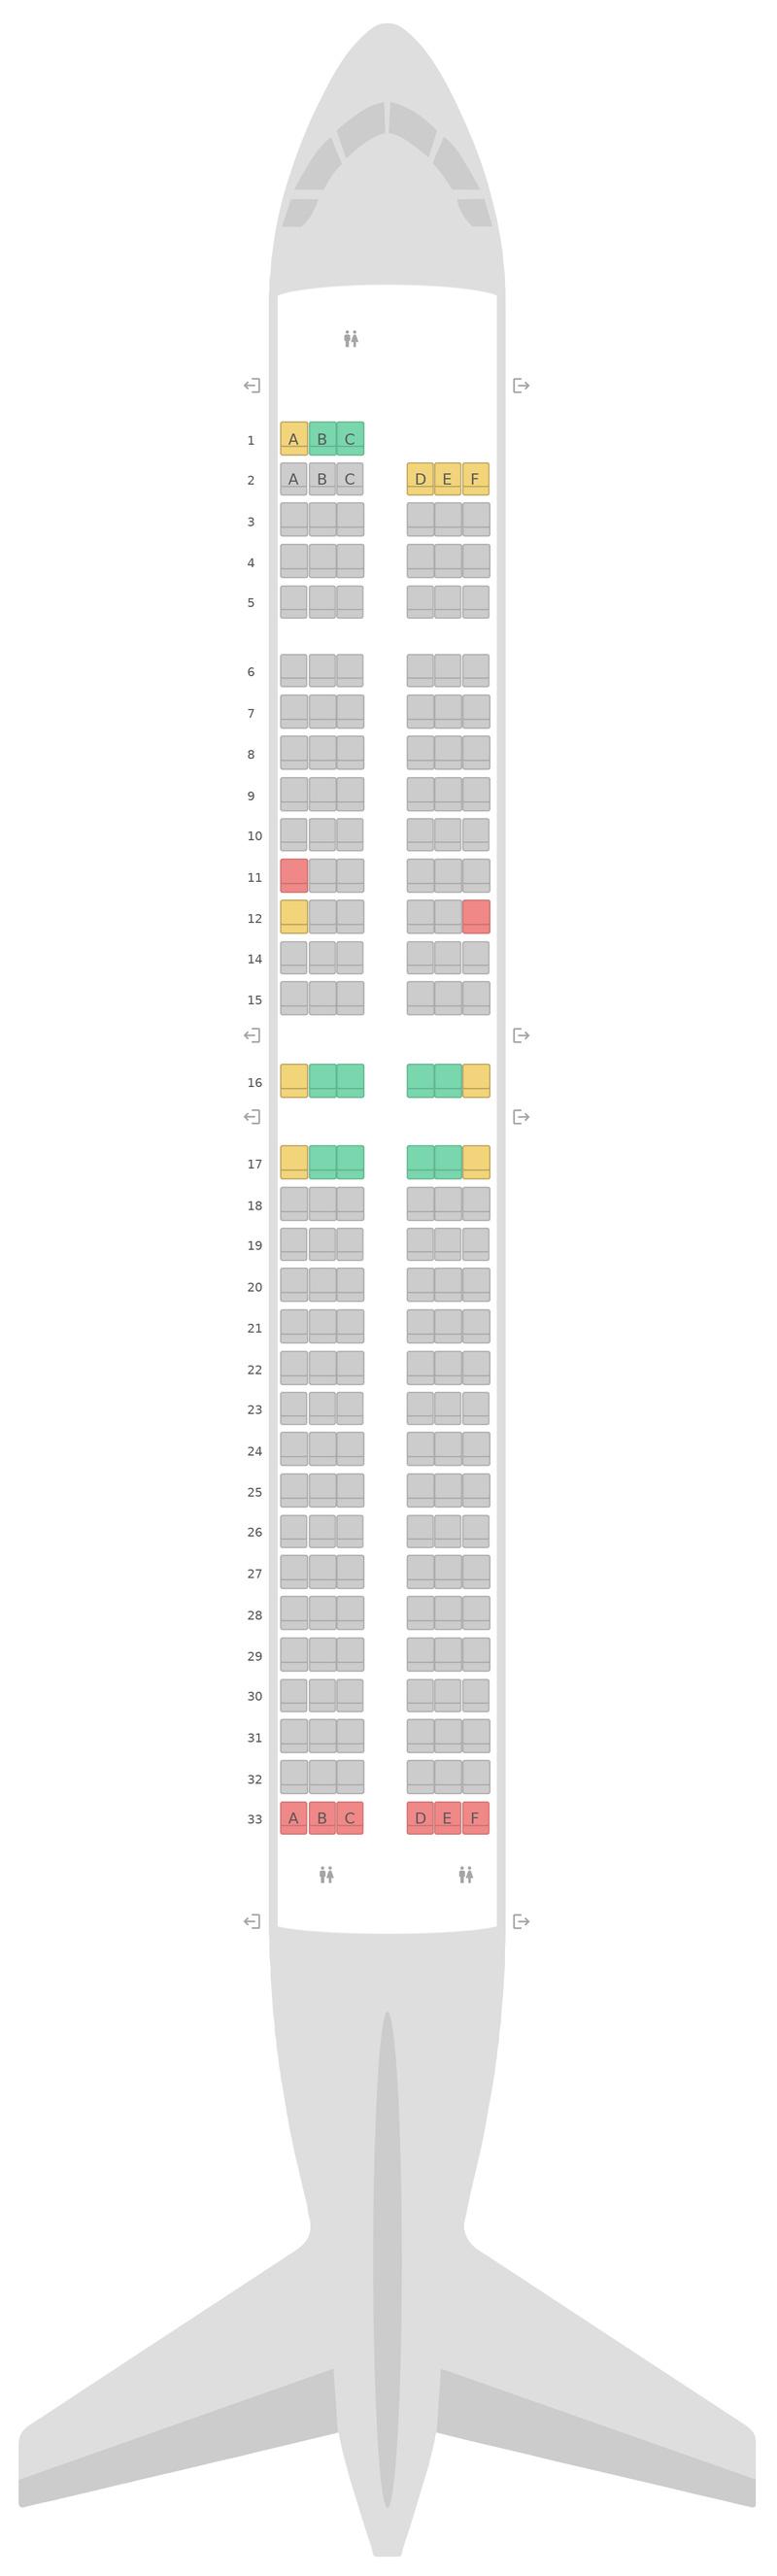 Mapa de asientos Boeing 737-800 (738) Ryanair